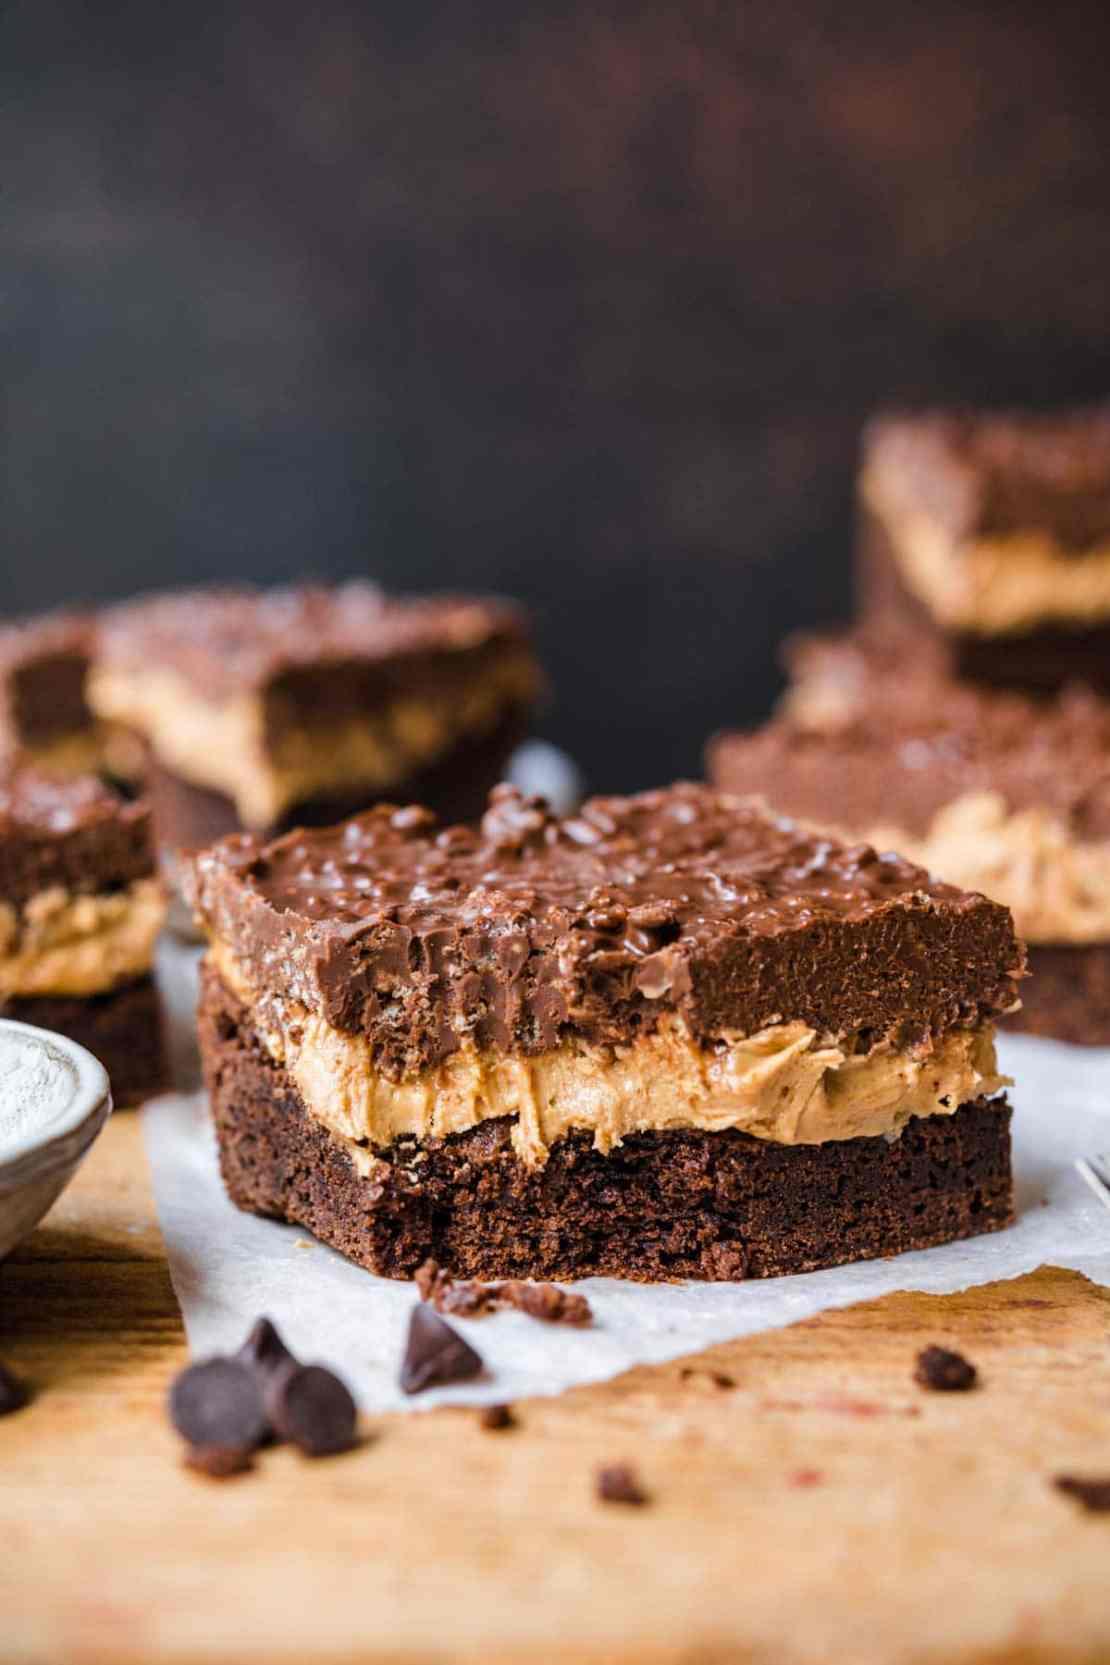 Crispy Chocolate Peanut Butter Brownie Bars on cutting board